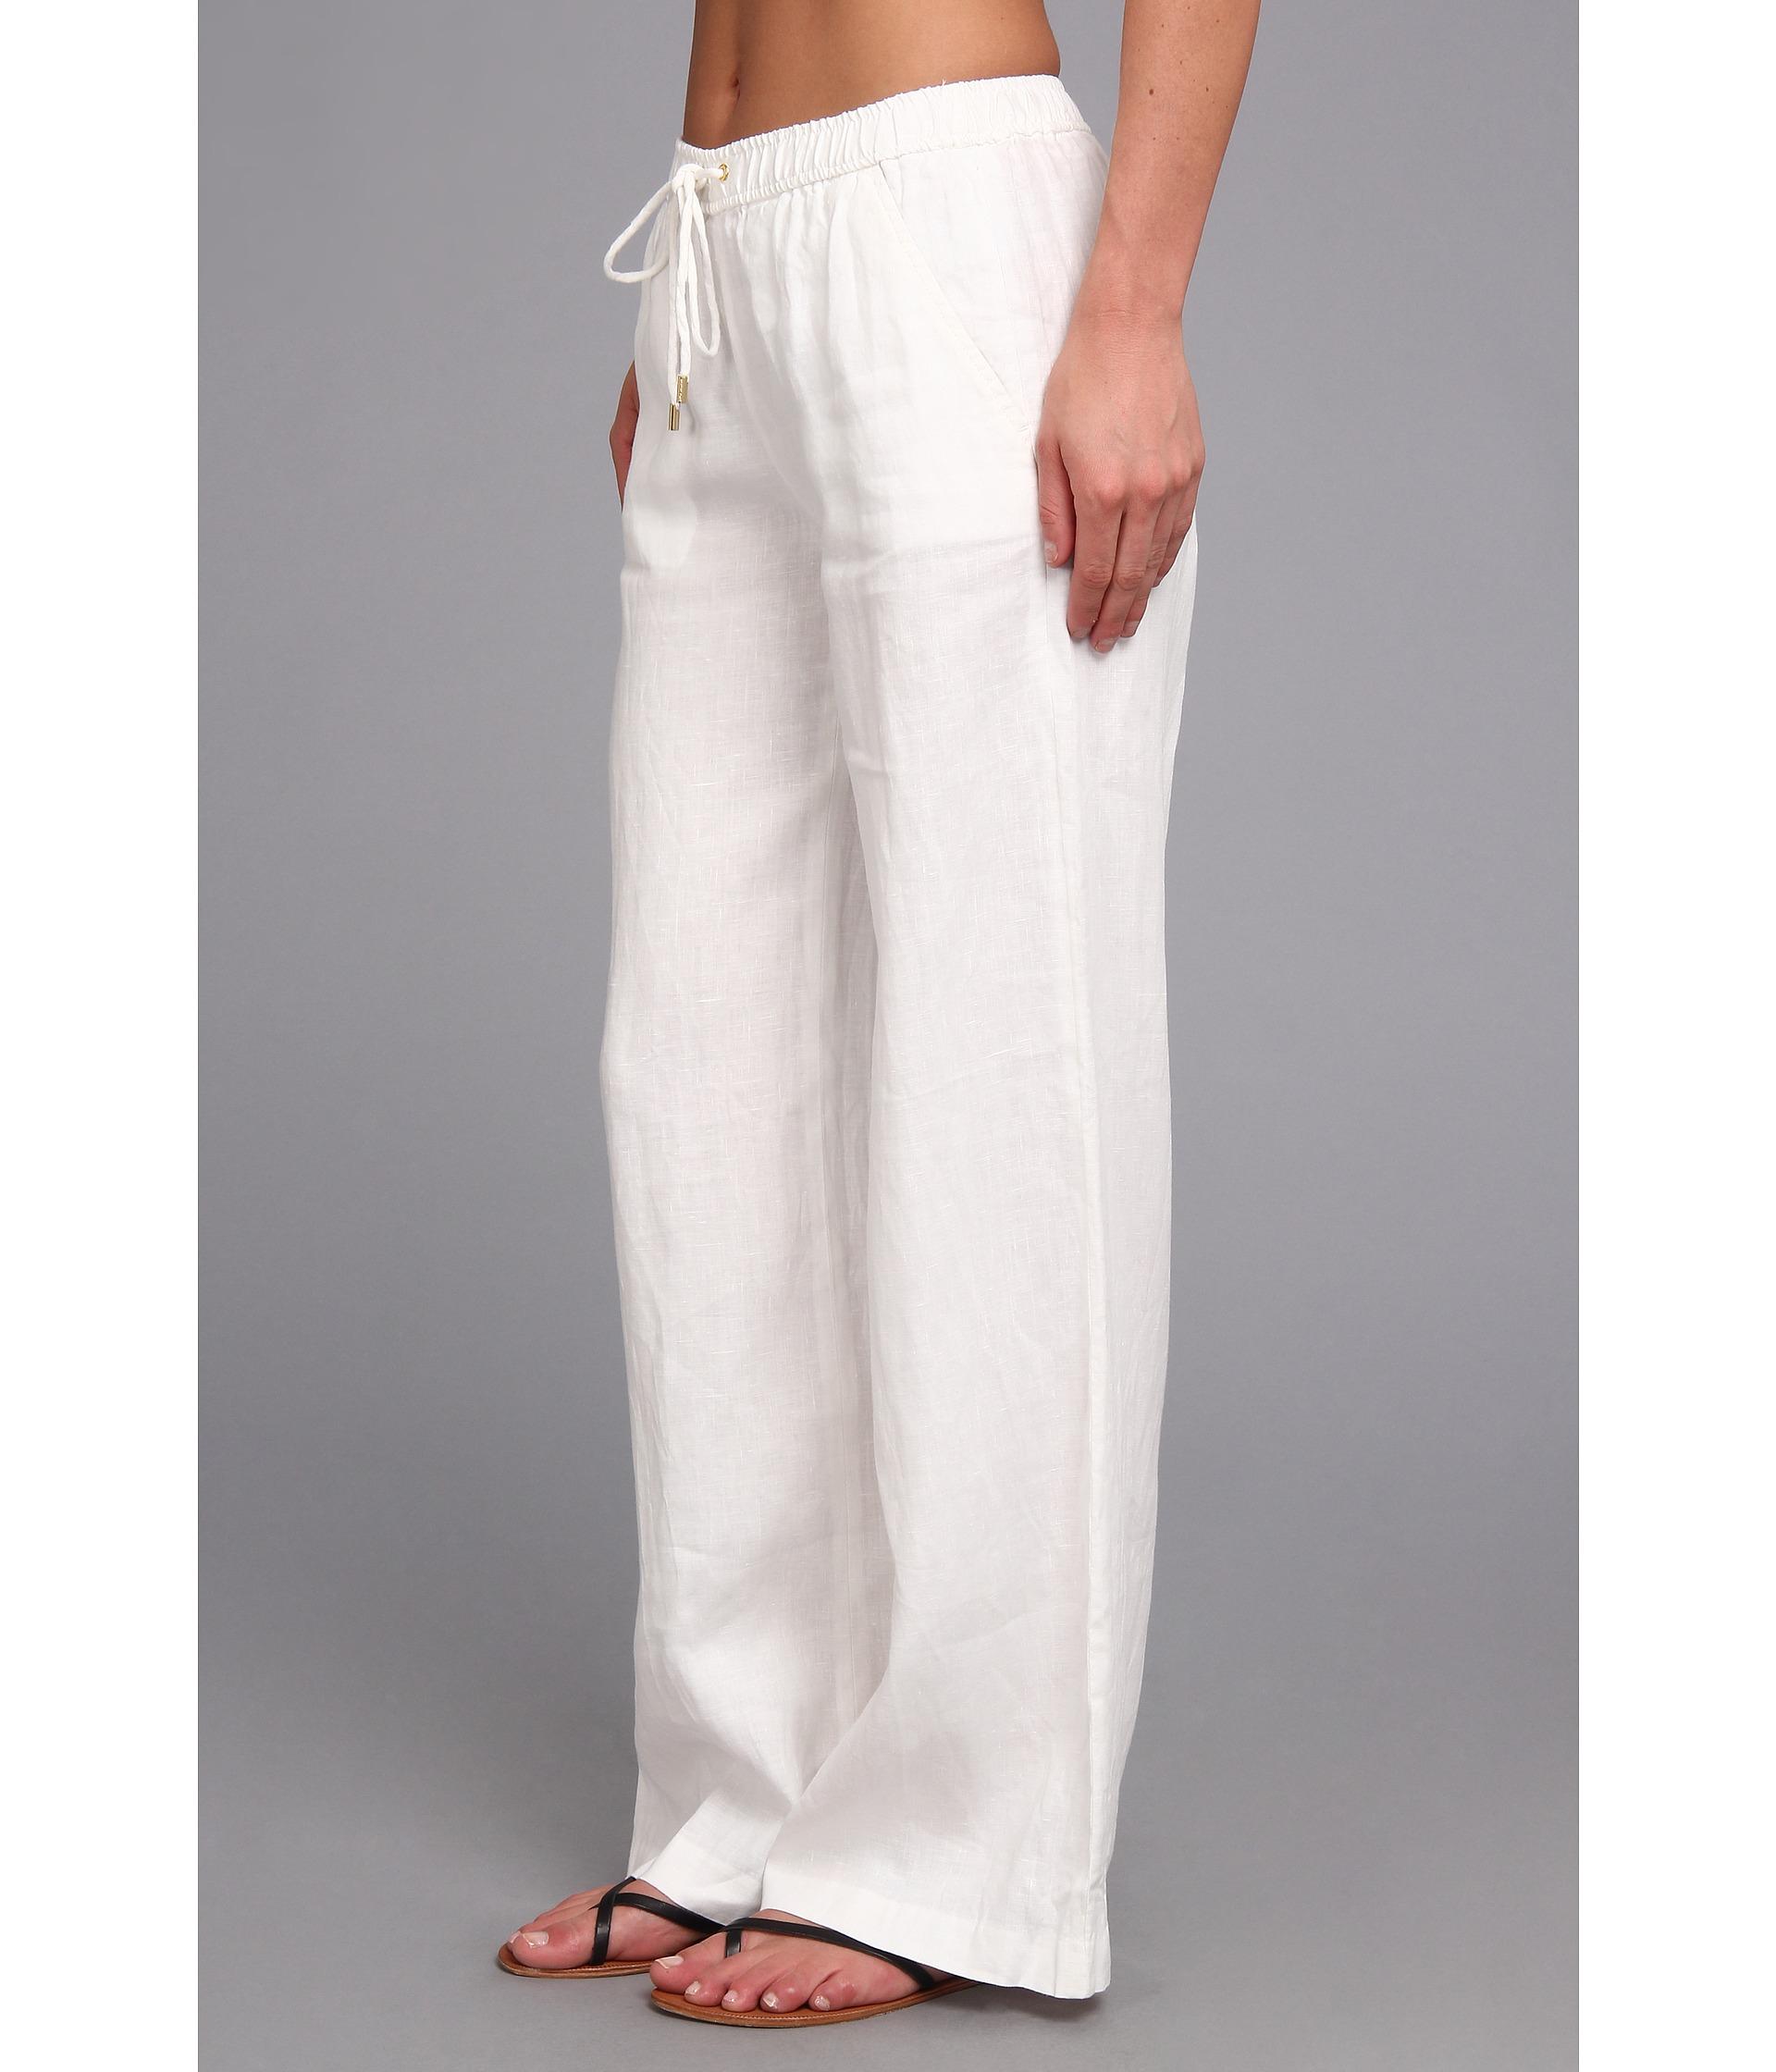 Michael michael kors Linen Wide Leg Pant in White | Lyst